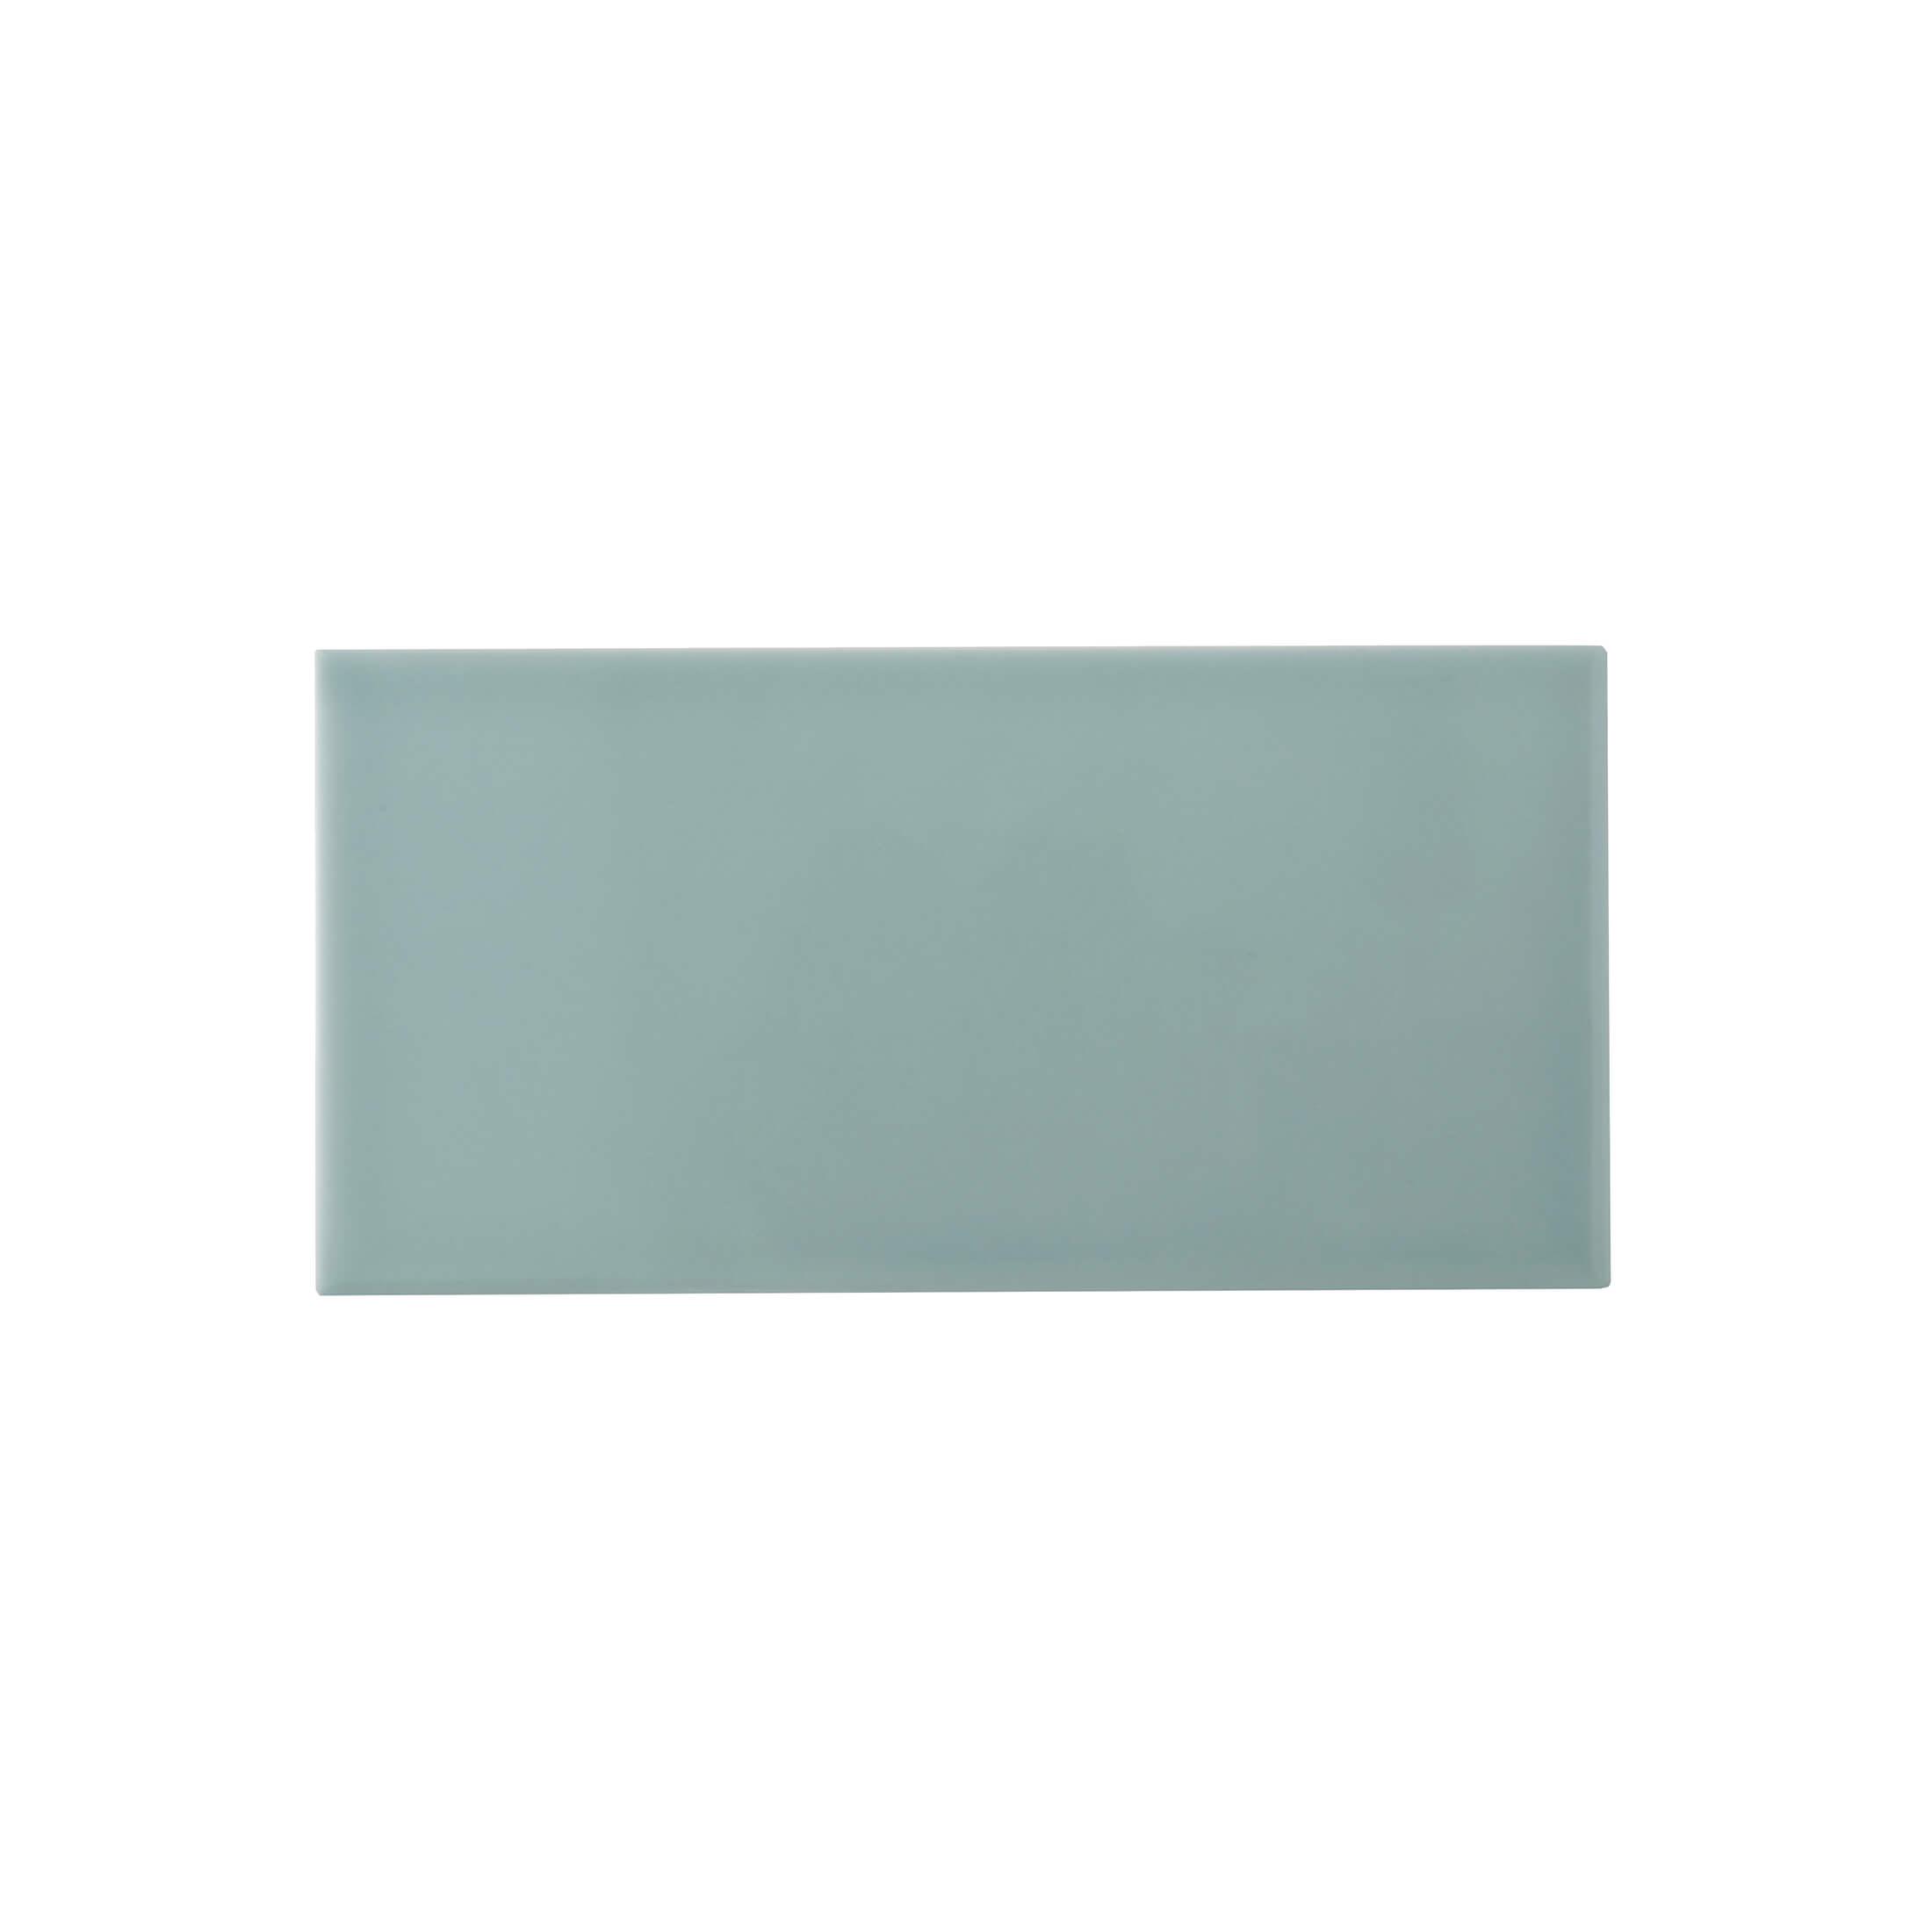 ADNE1101 - LISO PB - 10 cm X 20 cm